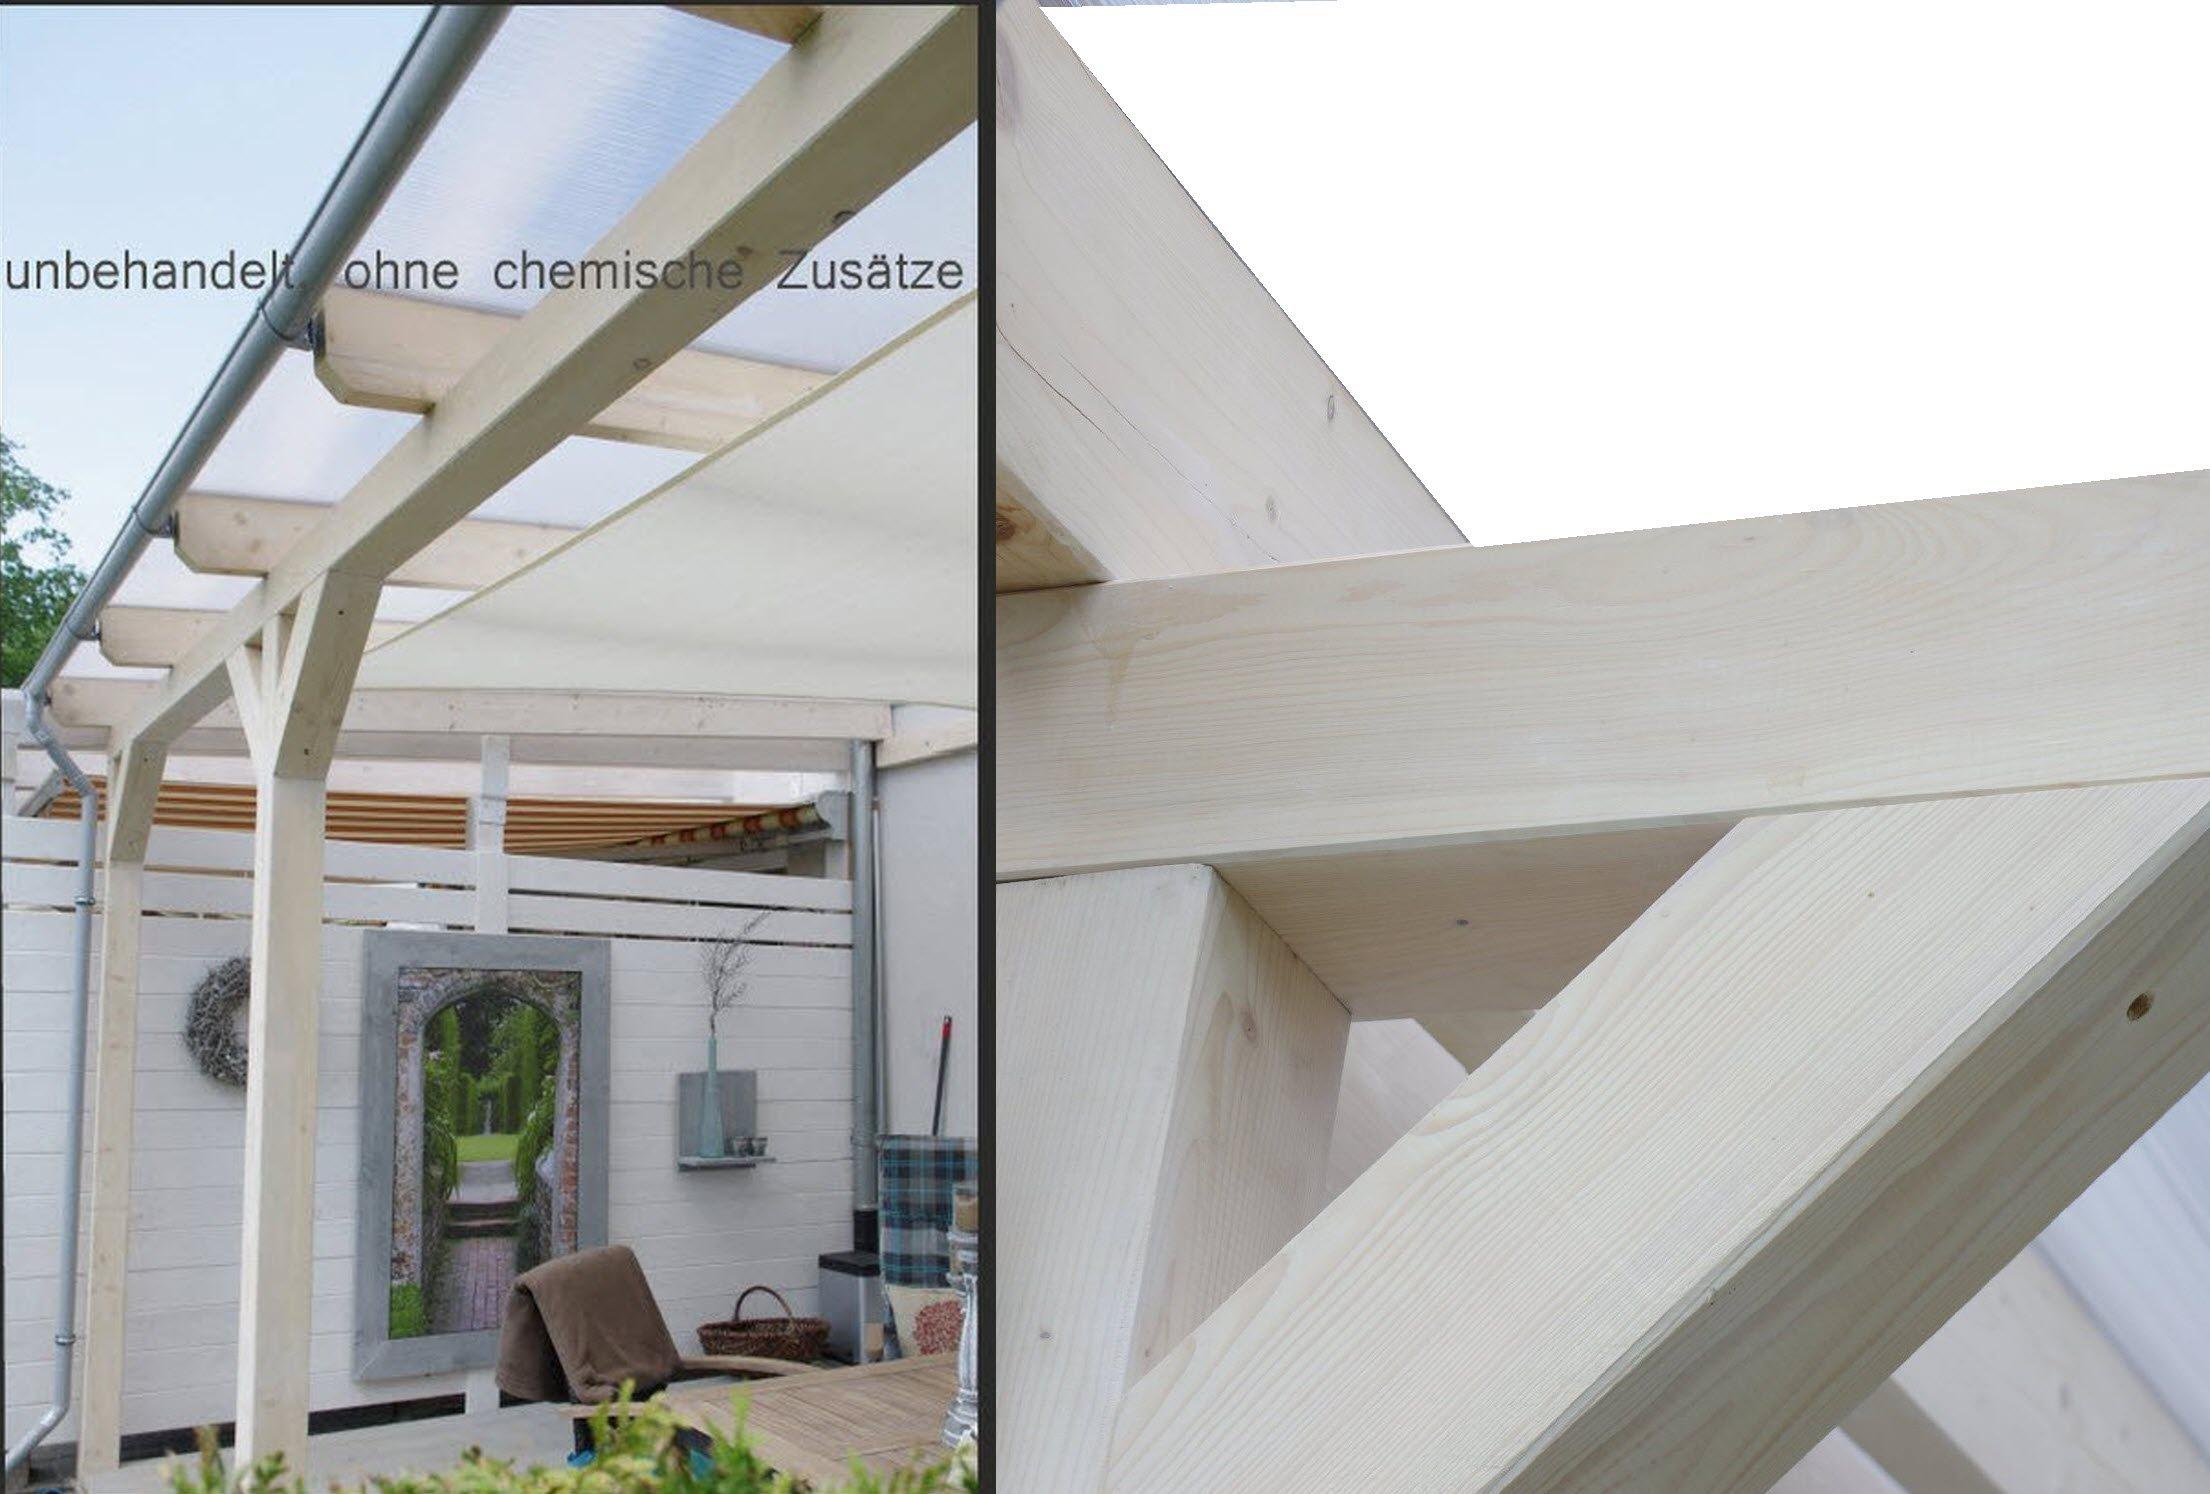 solidbasic con VSG Cristal 300 x 200 cm – prikker-überdachungen ...